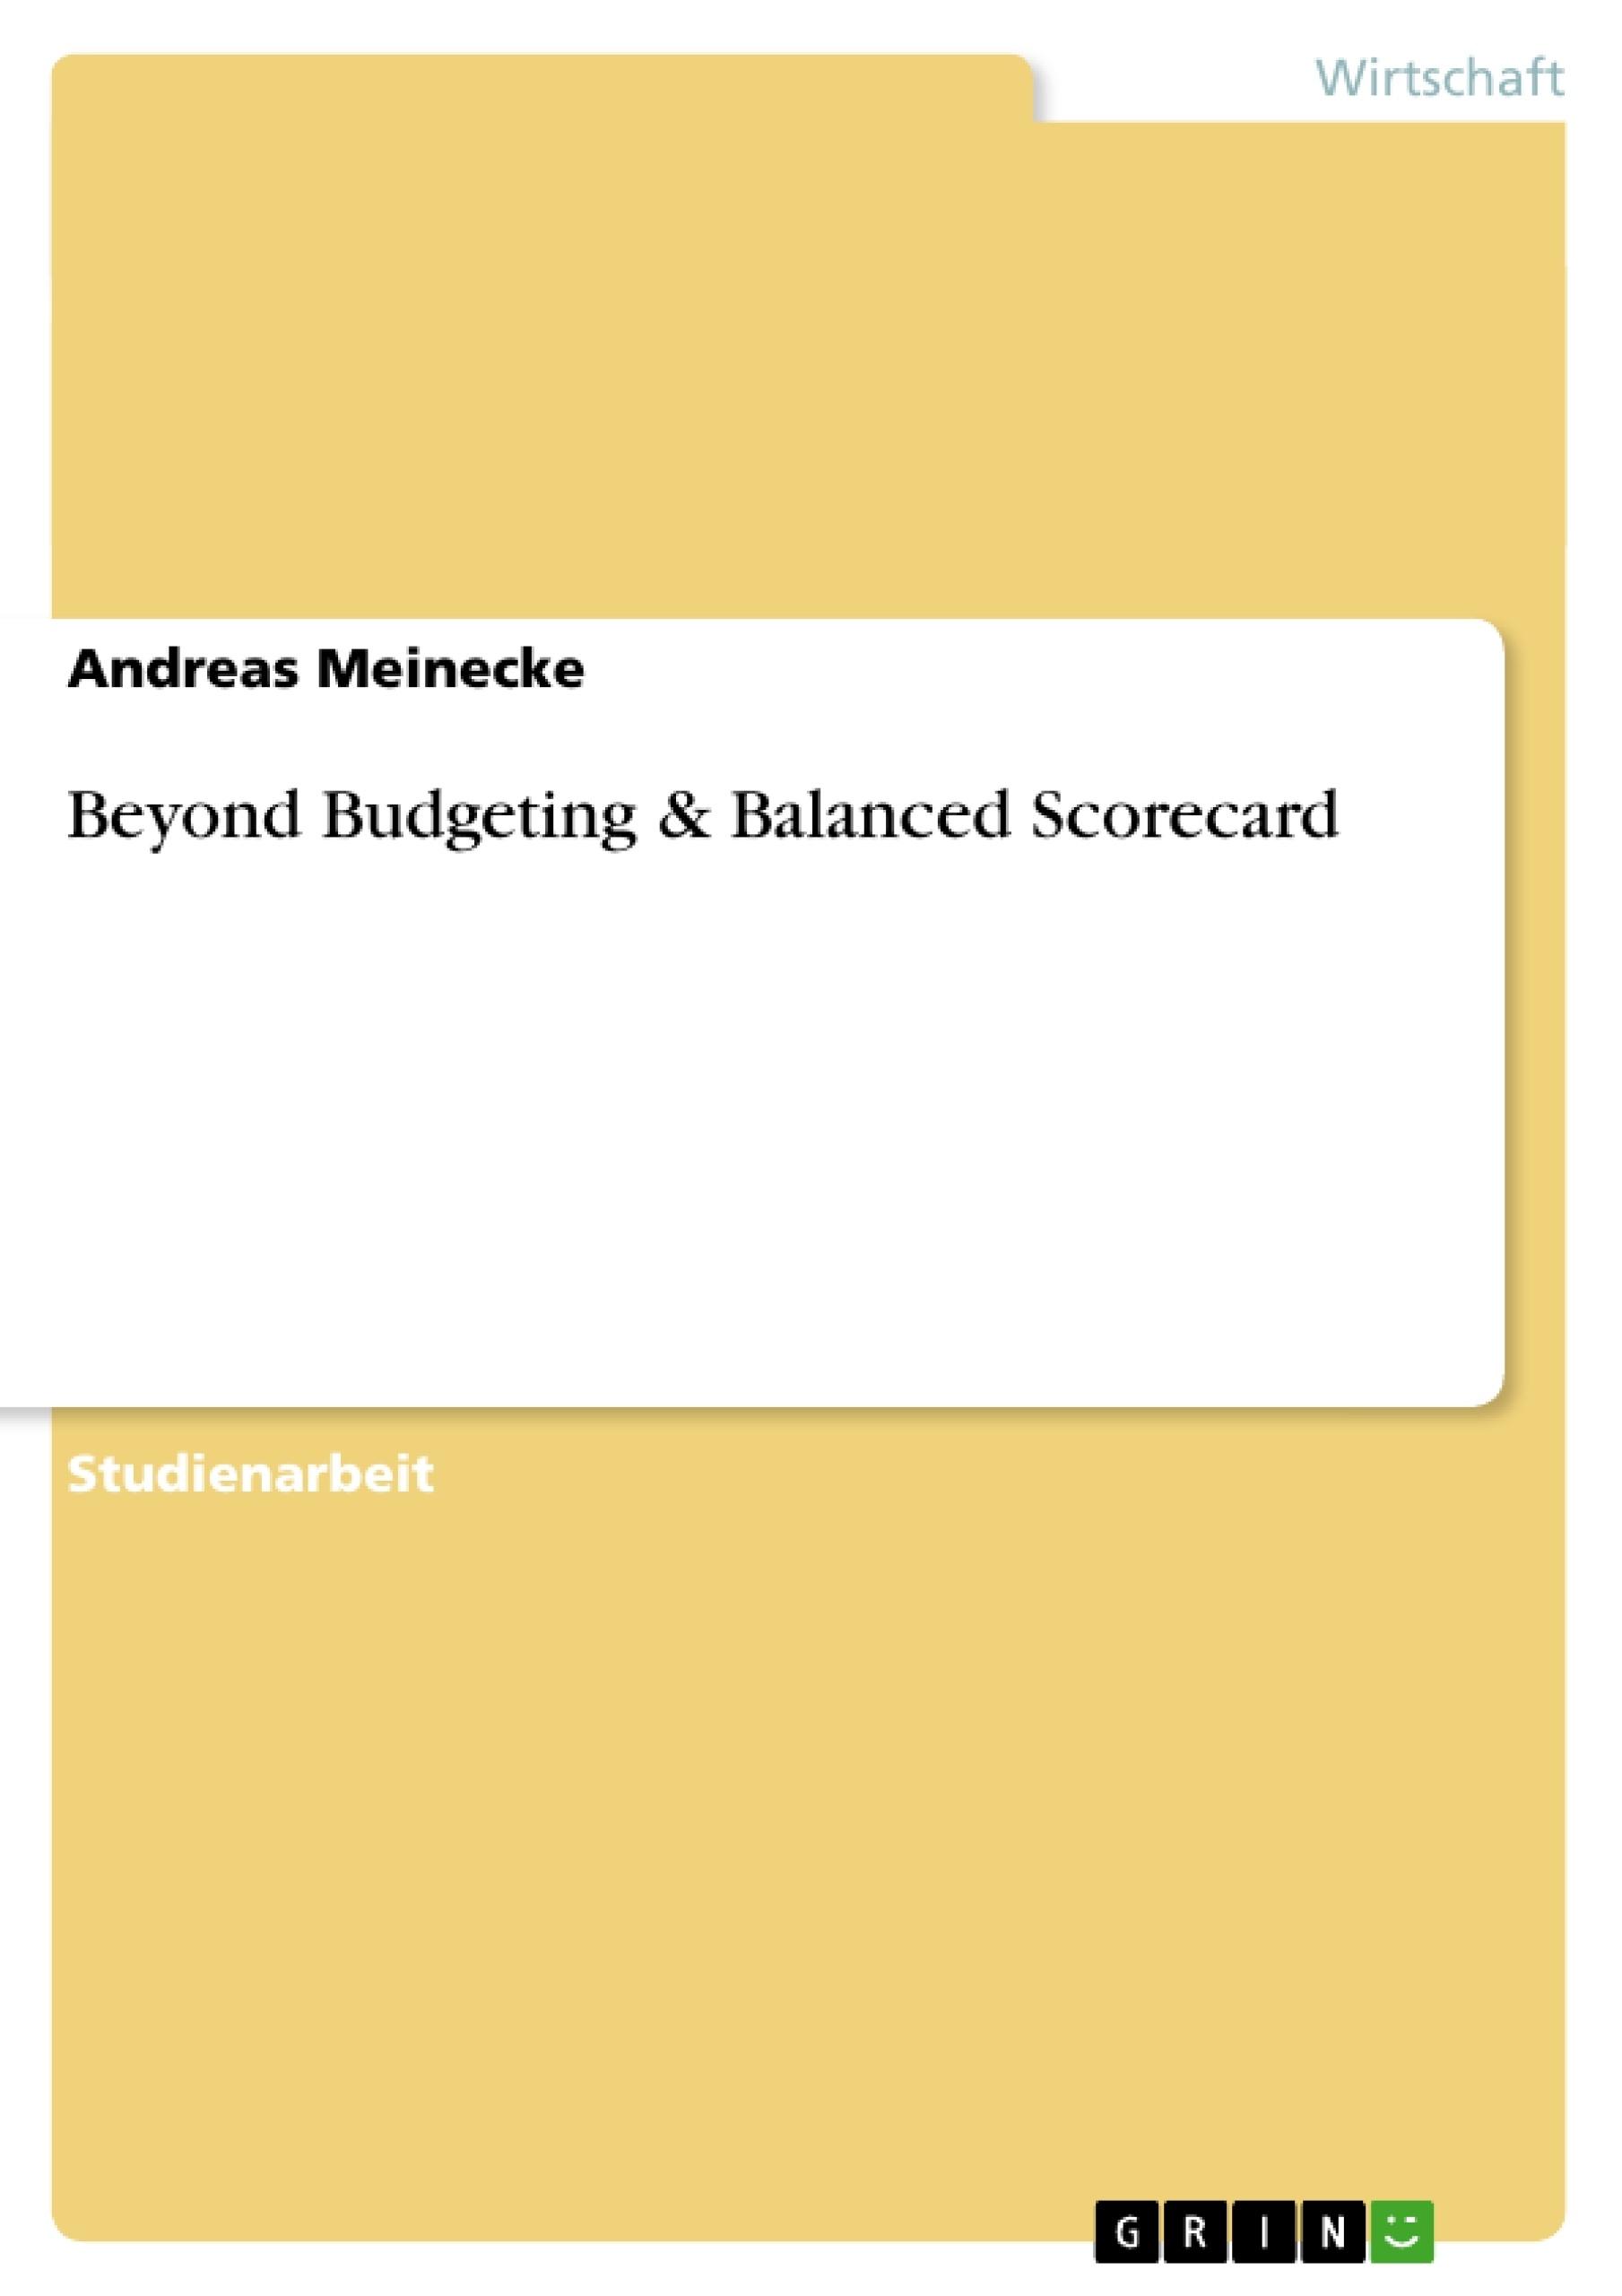 Titel: Beyond Budgeting & Balanced Scorecard